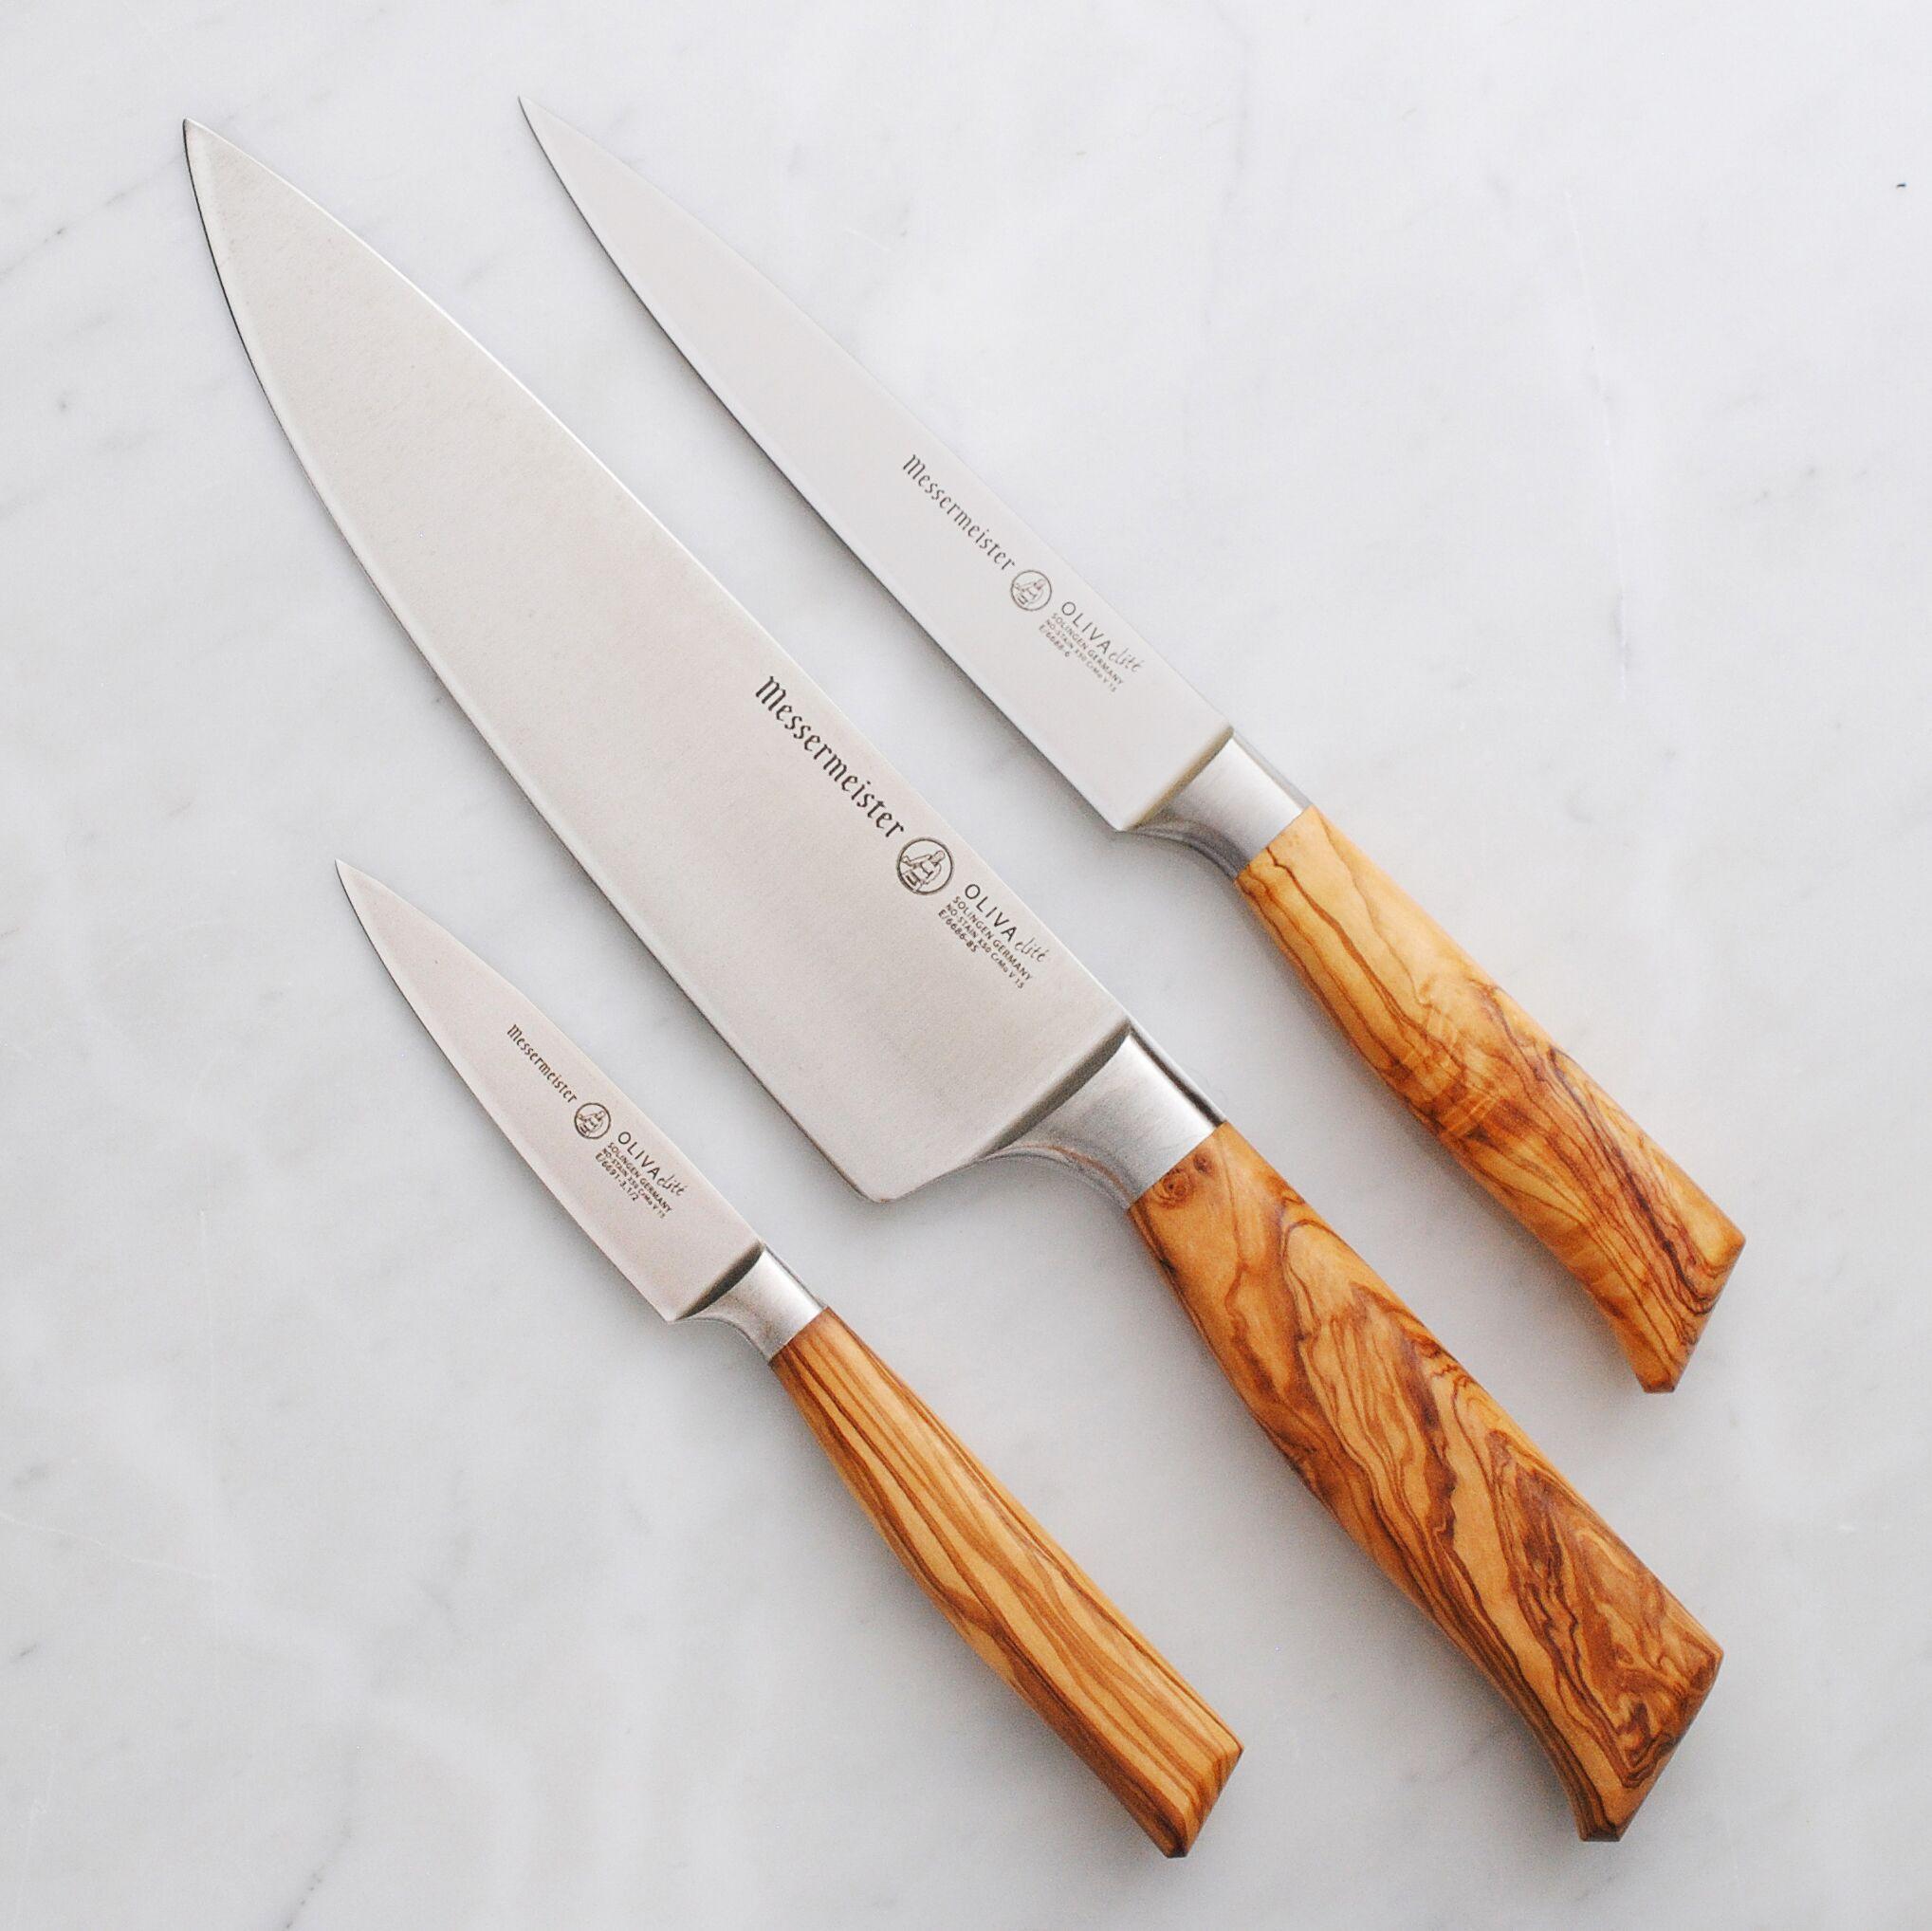 Messermeister Oliva Elite 3-Piece Starter Knife Set